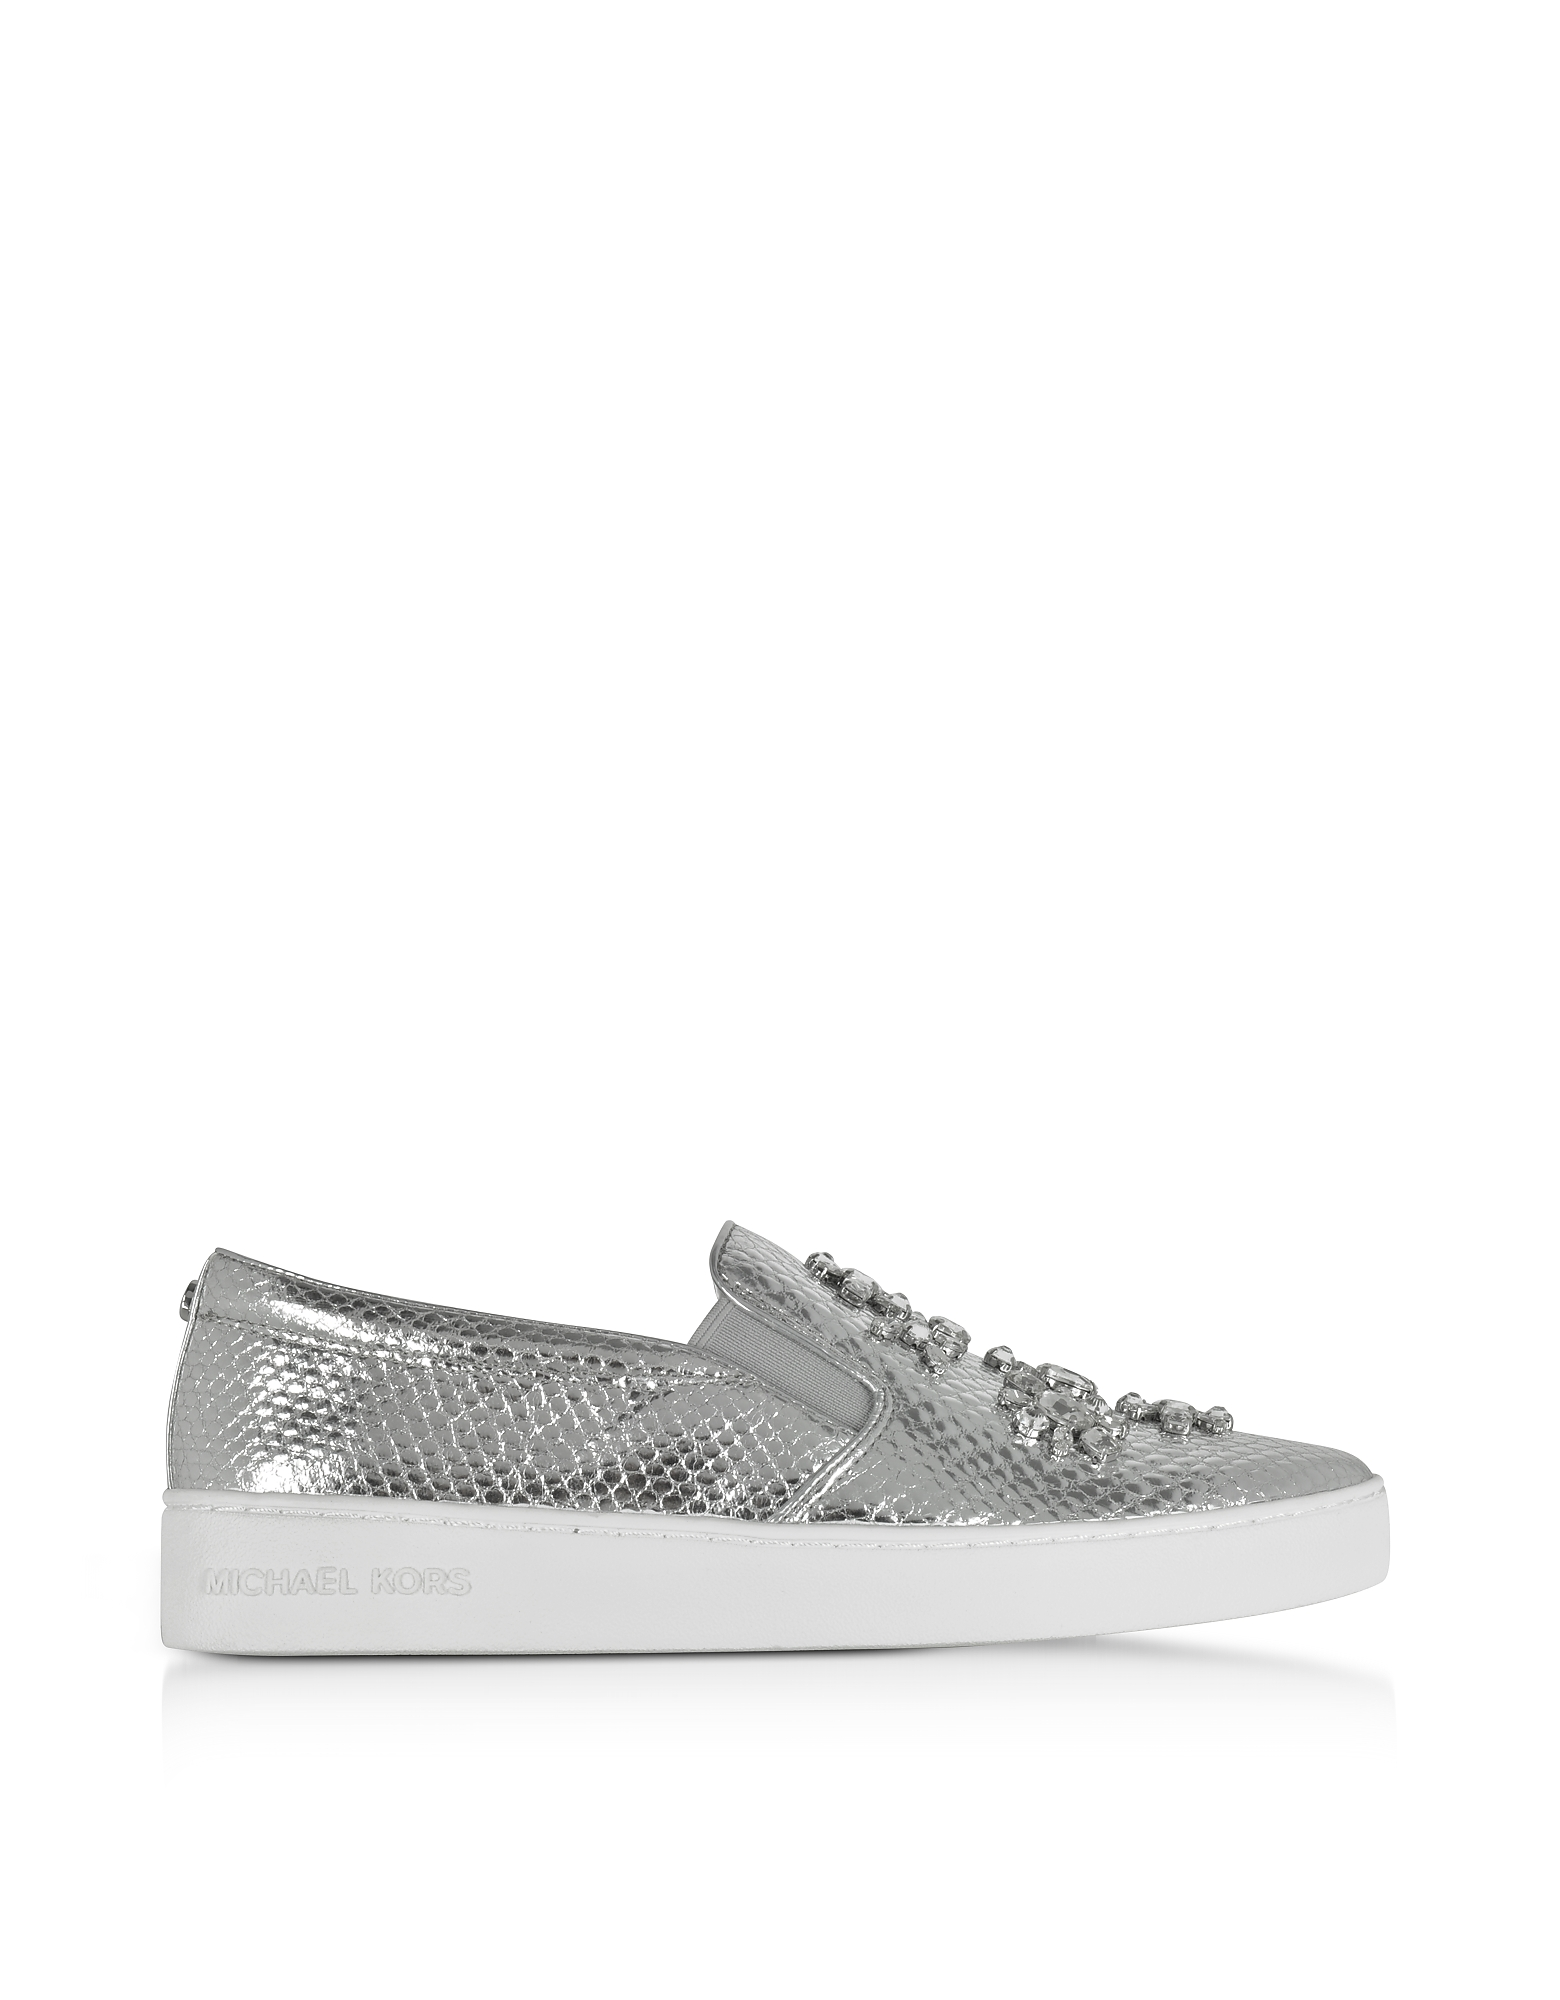 Michael Kors Keaton Silver Metallic Embossed Snake Leather Slip On Sneakers w/Jewels